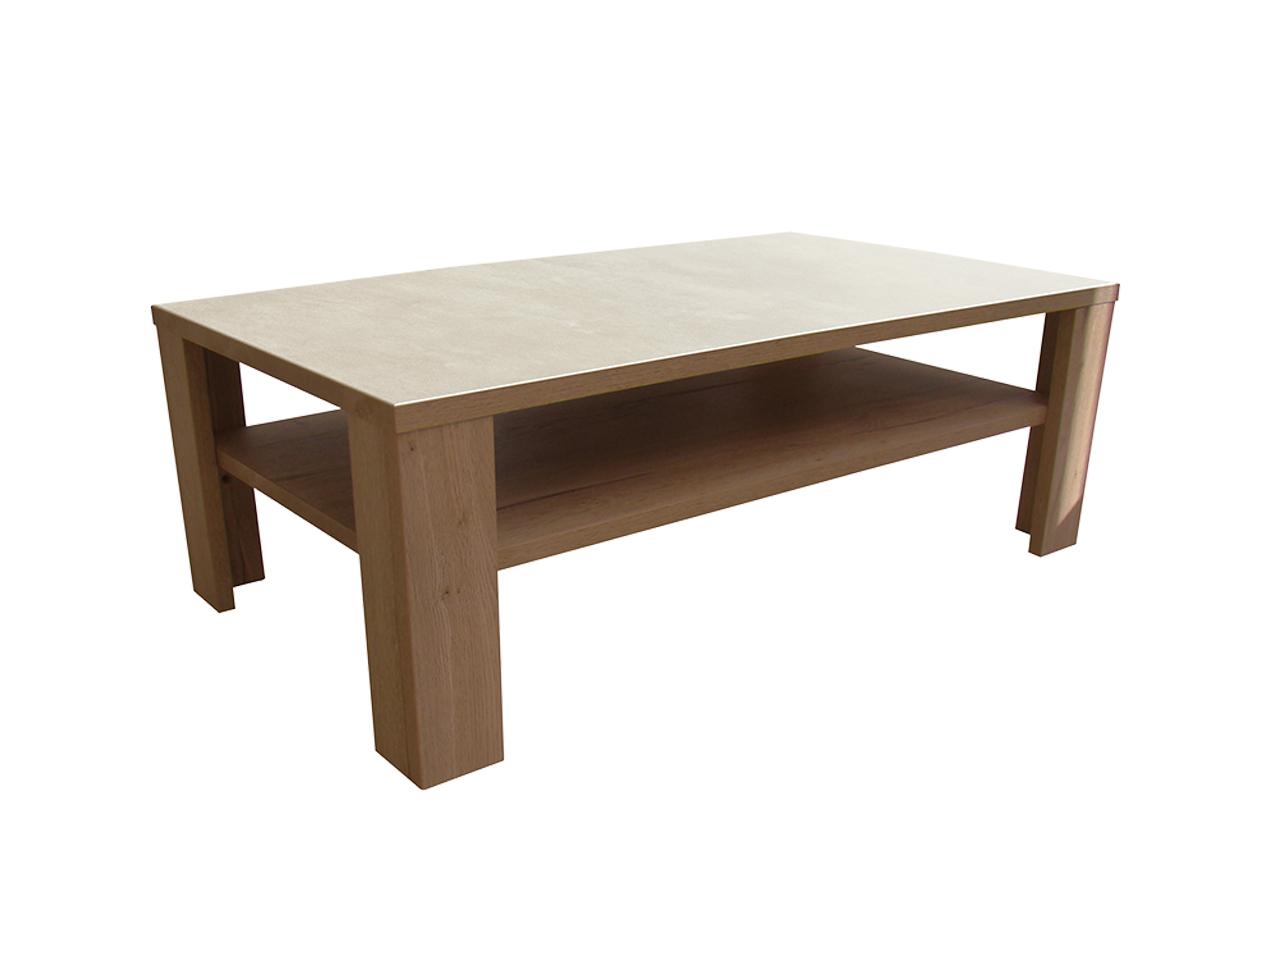 table basse himalaya pieds bois ch ne tabac ceram craie meubles minet. Black Bedroom Furniture Sets. Home Design Ideas